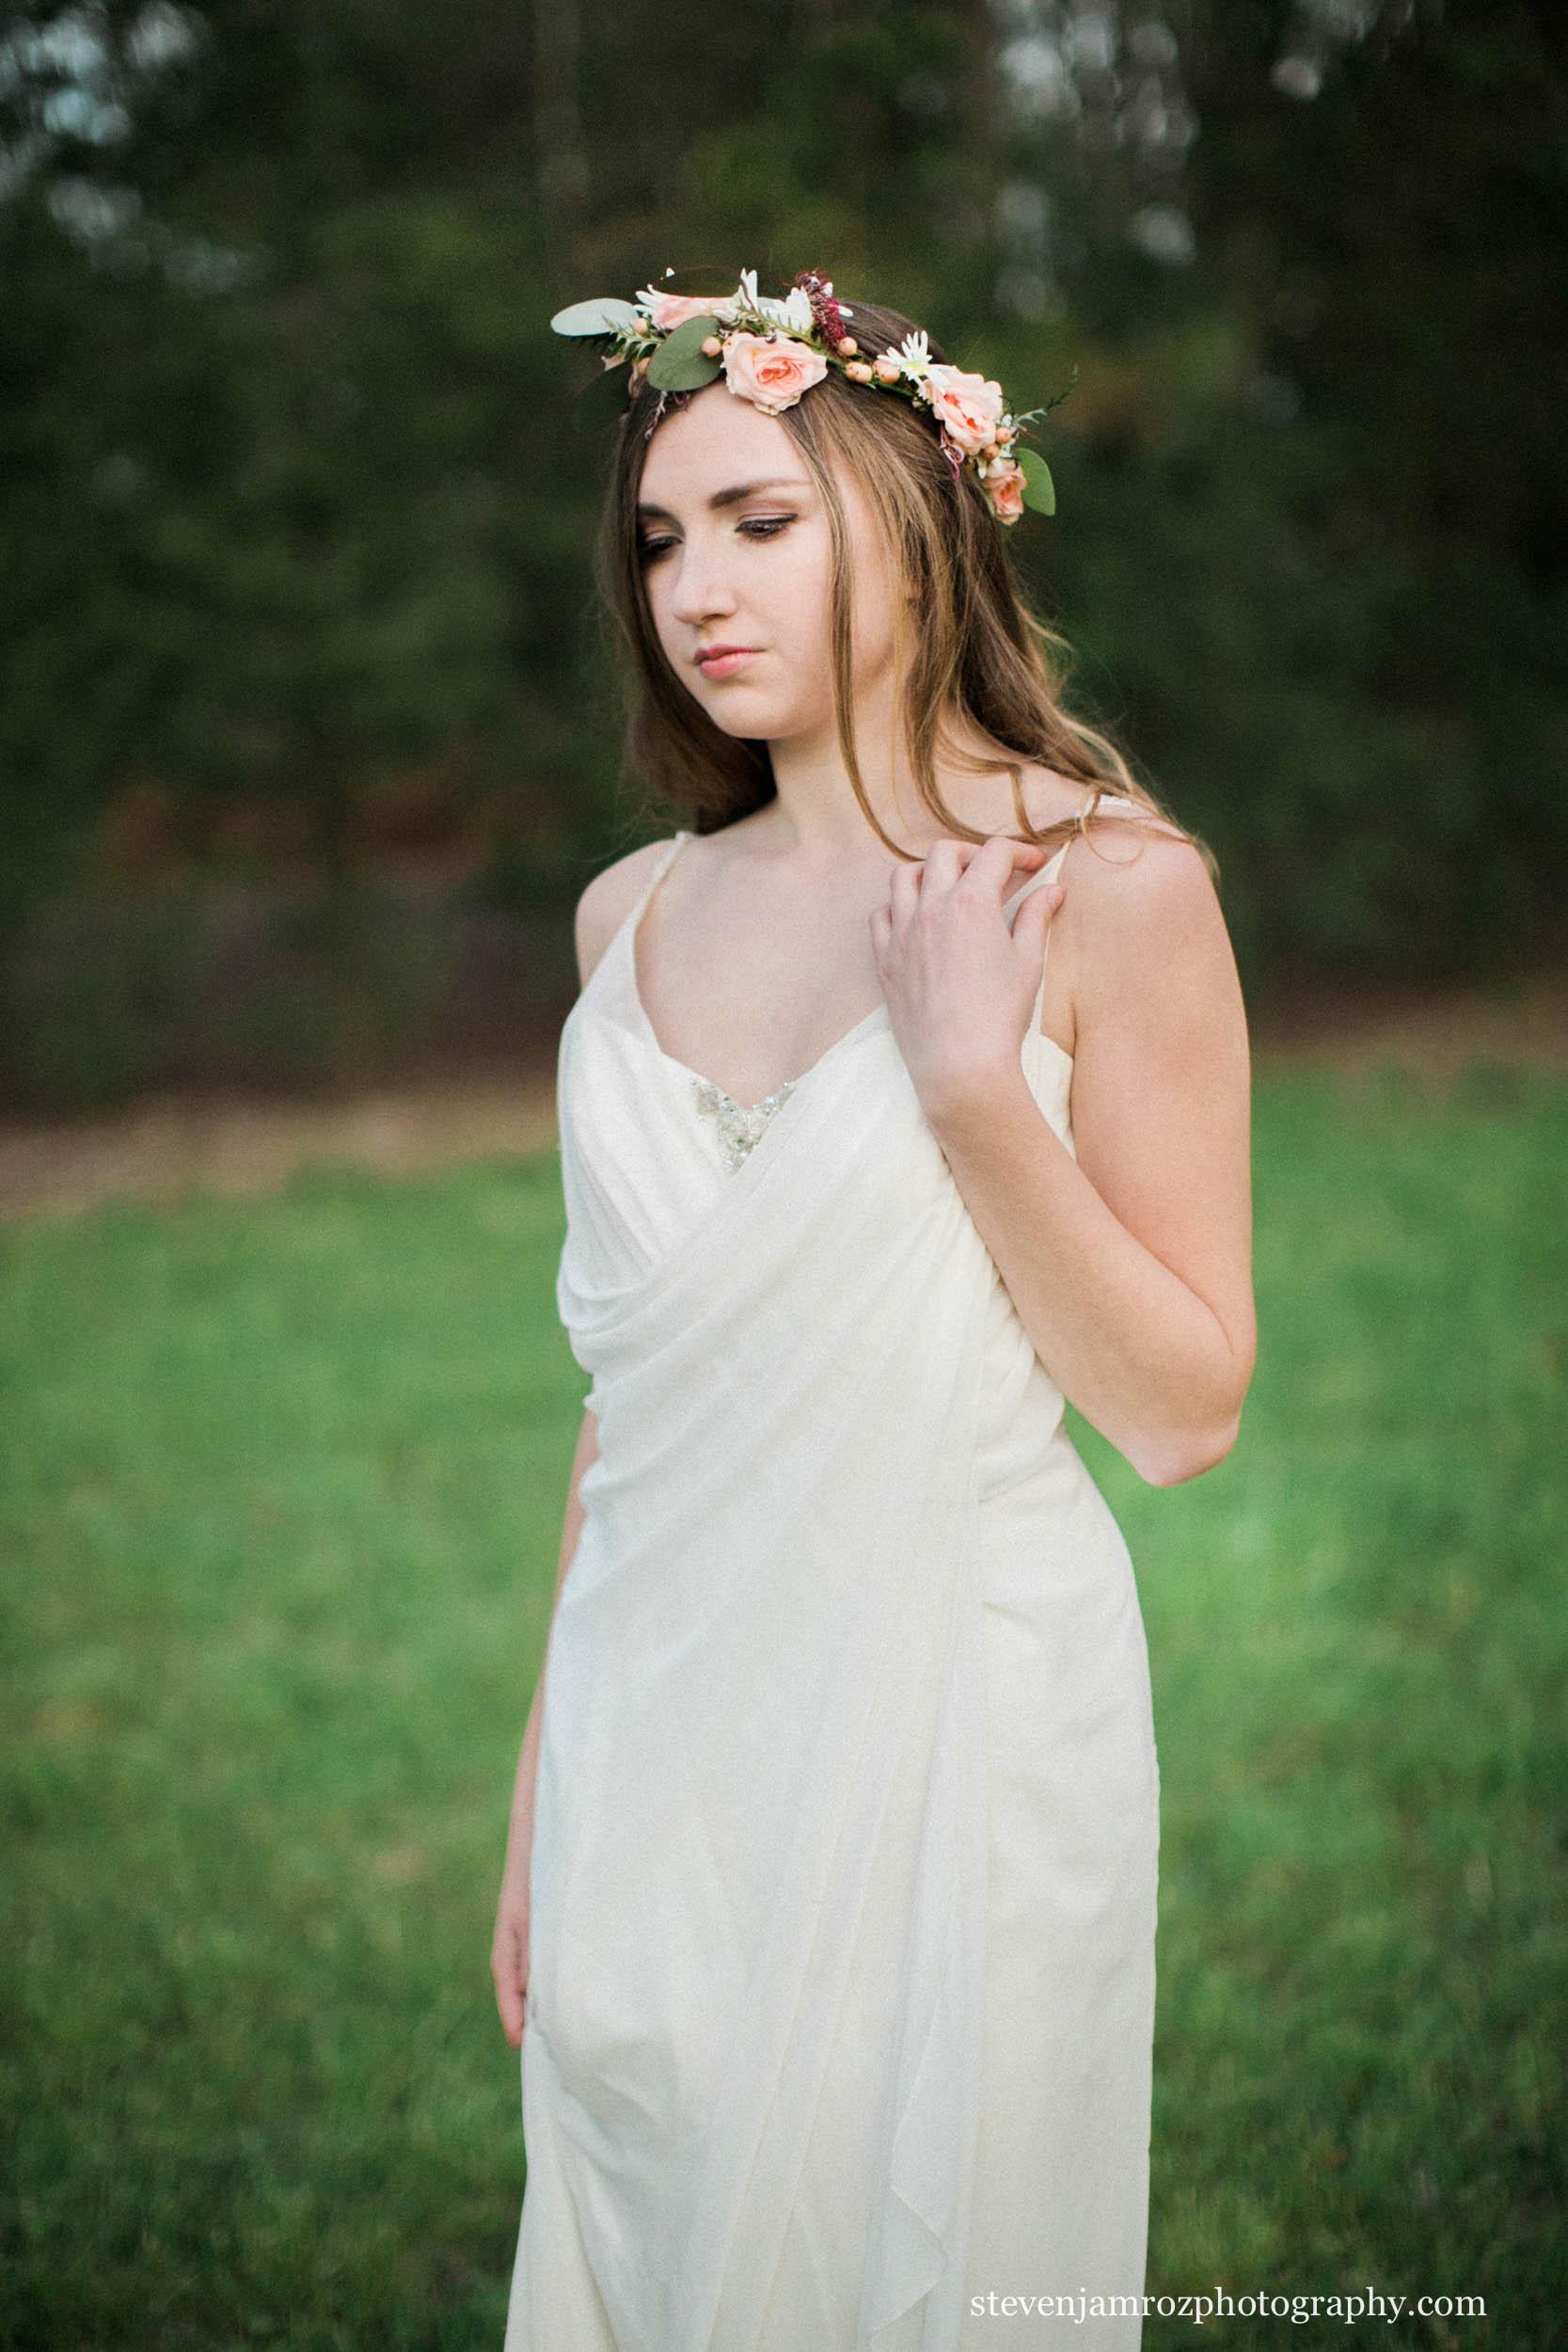 pretty-bride-styled-photo-shoot-raleigh-rustic-wedding-venue.jpg